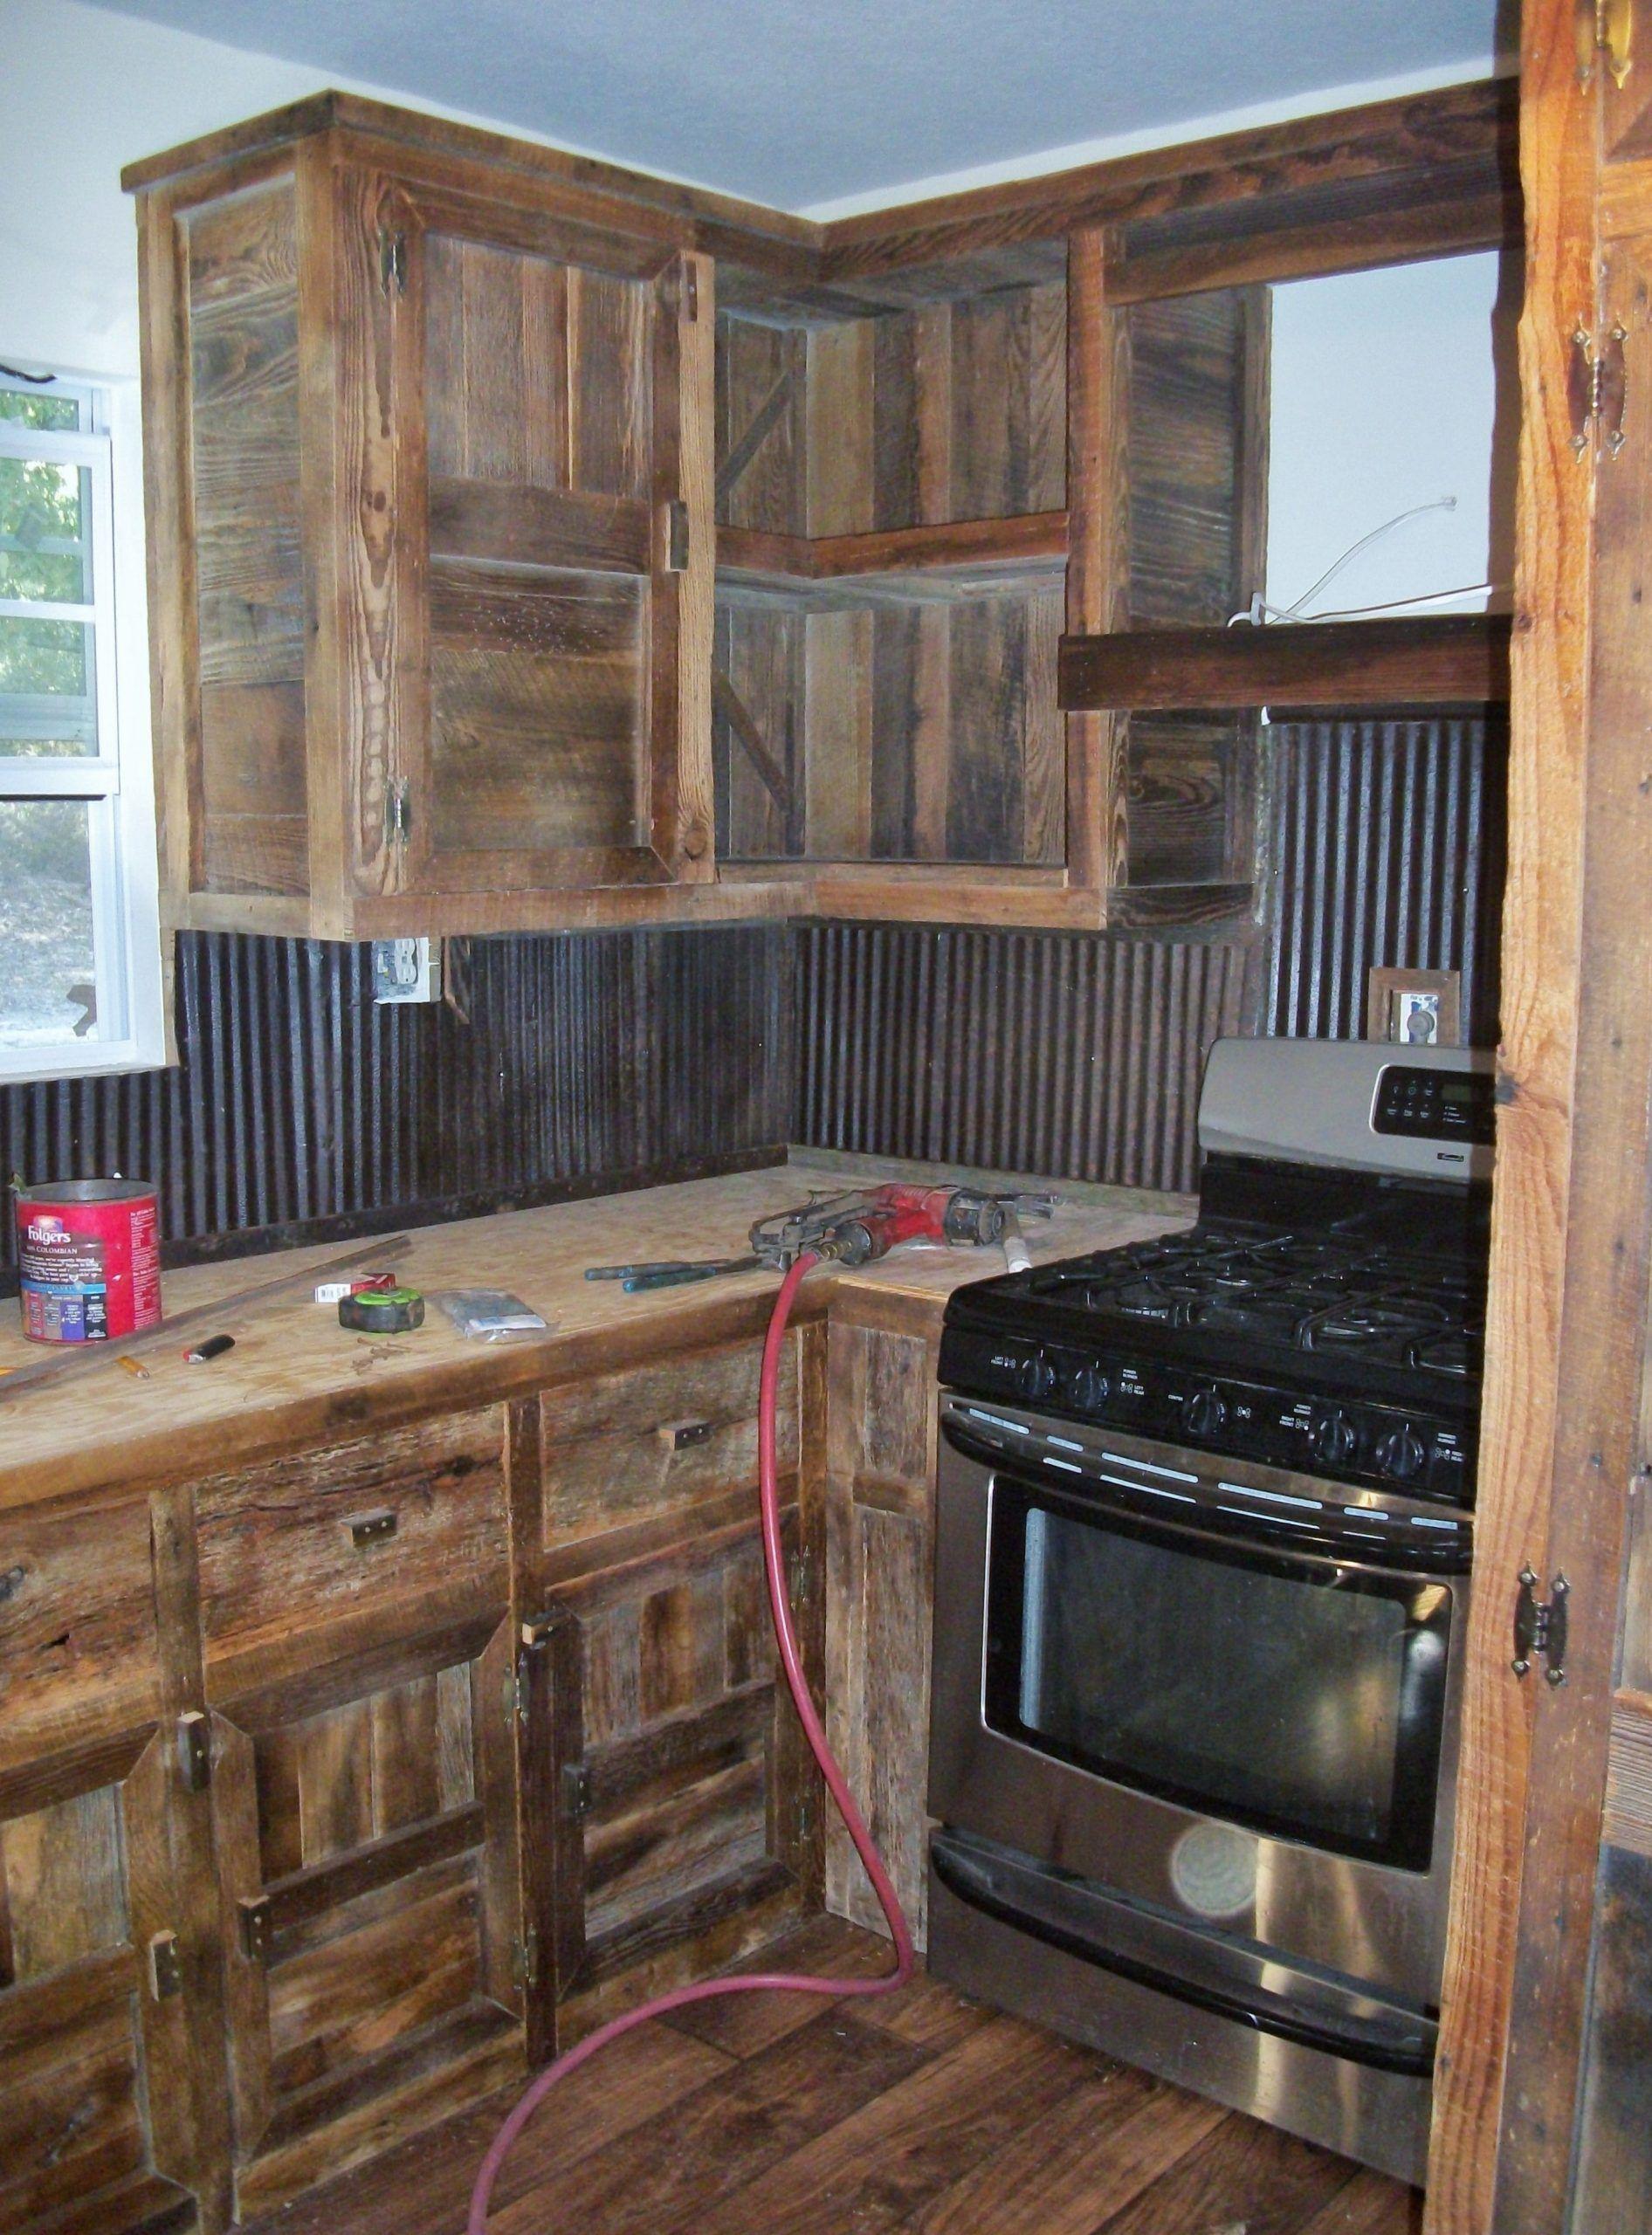 Barn Red Kitchen Cabinets For Sale Barn Cabinets Kitchen Red Sale Barn Cabinets Kitchen Red Sal In 2020 Barn Red Kitchen Rustic Kitchen Cabinets Rustic Kitchen